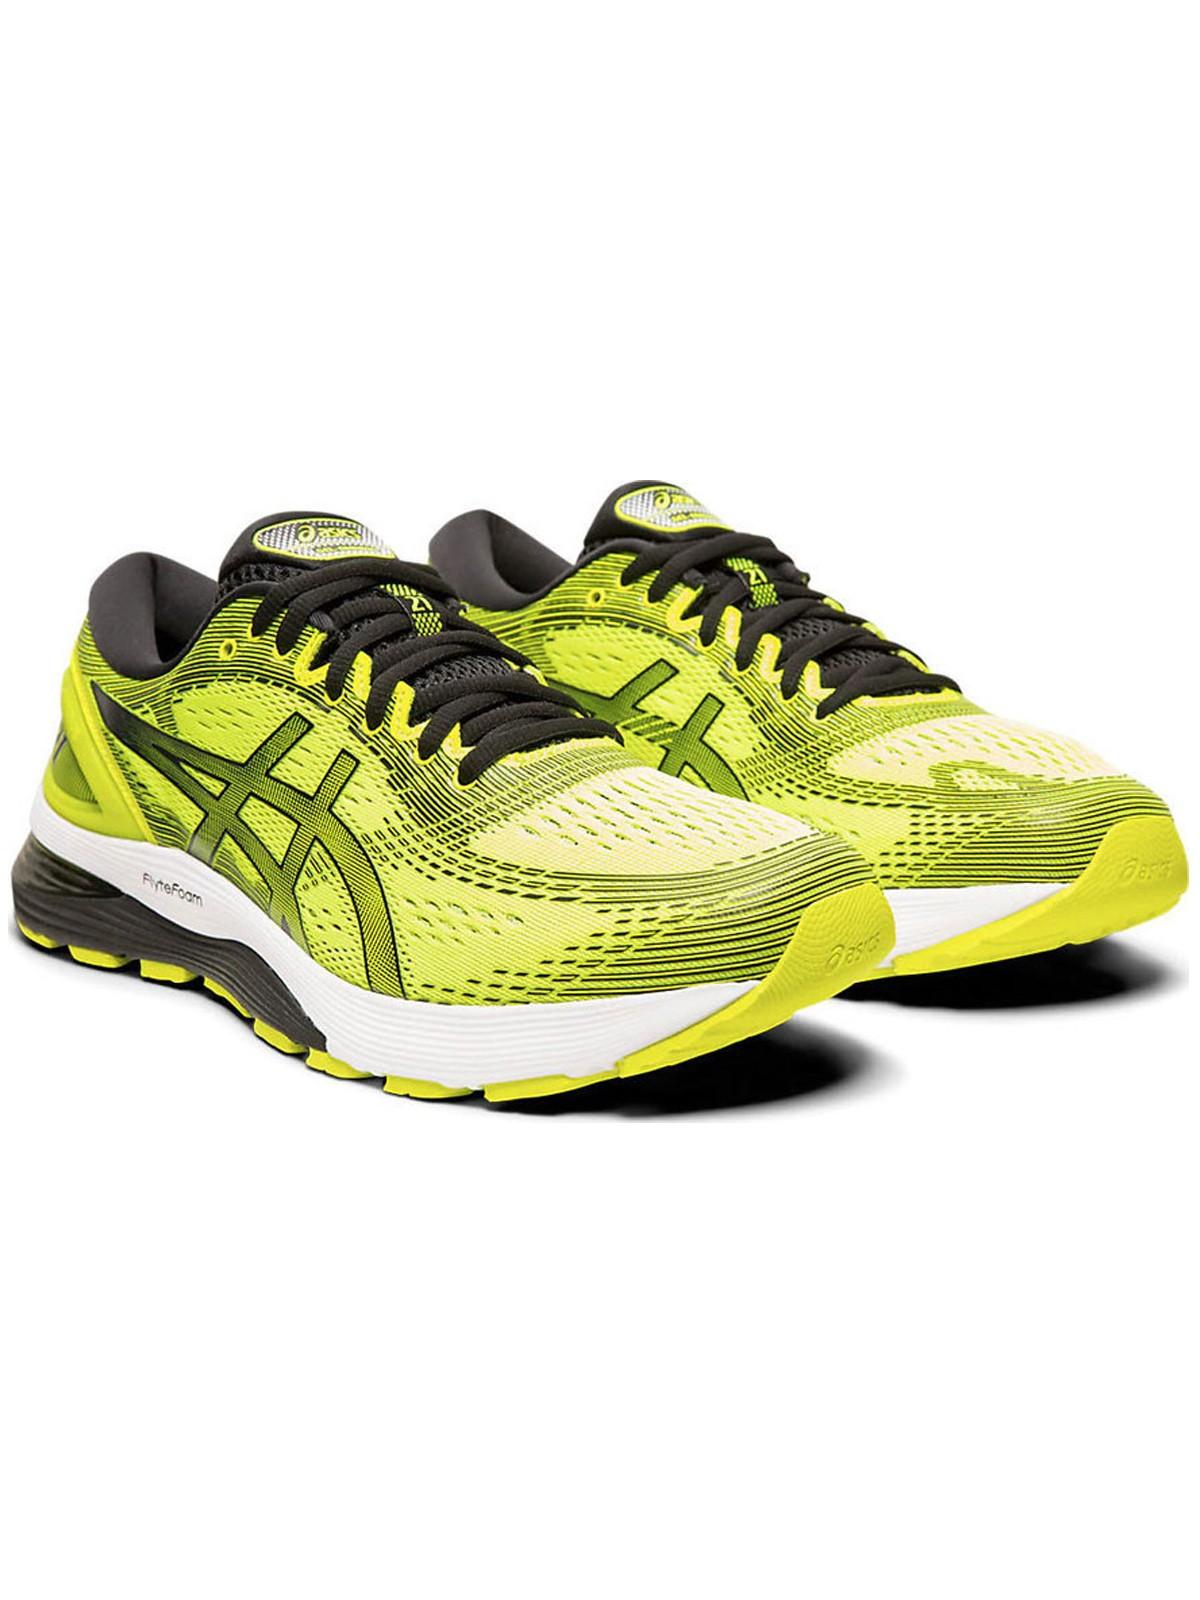 Running Asics Scarpe Running Gel Nimbus 21 Giallo Uomo 1011A169750